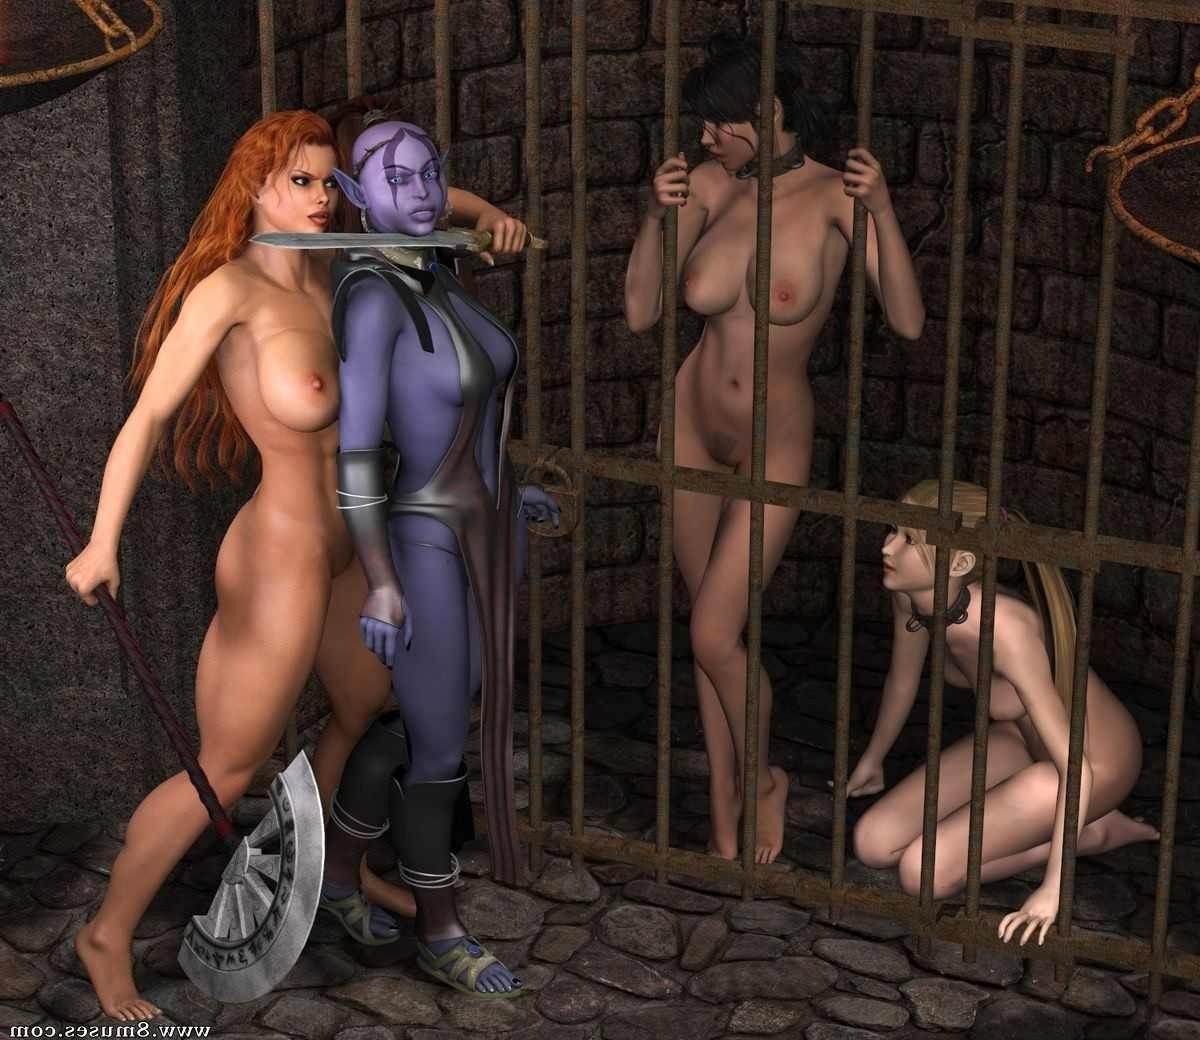 Lesbian witch jelena jensen uses voodoo